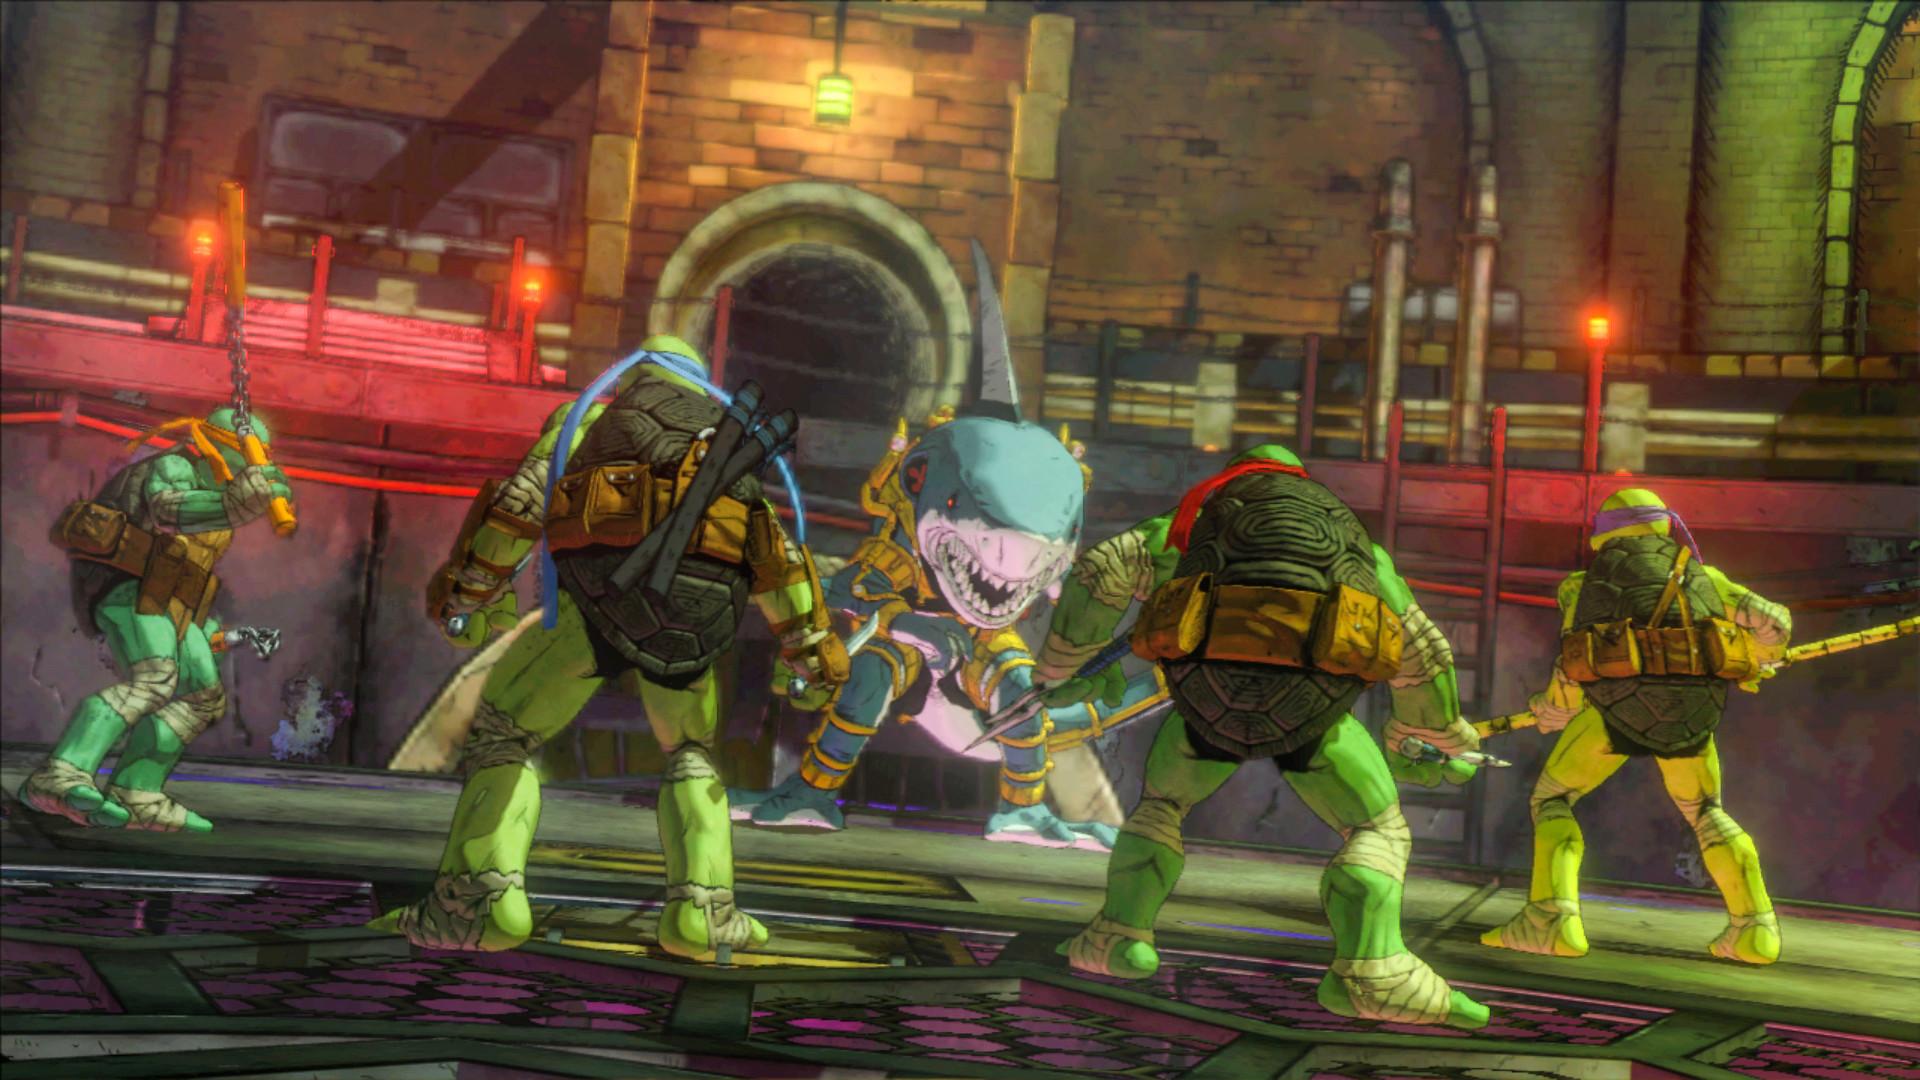 Teenage Mutant Ninja Turtles Mutants In Manhattan ESPAÑOL PC Full (CODEX) + REPACK 2 DVD5 (JPW) 7